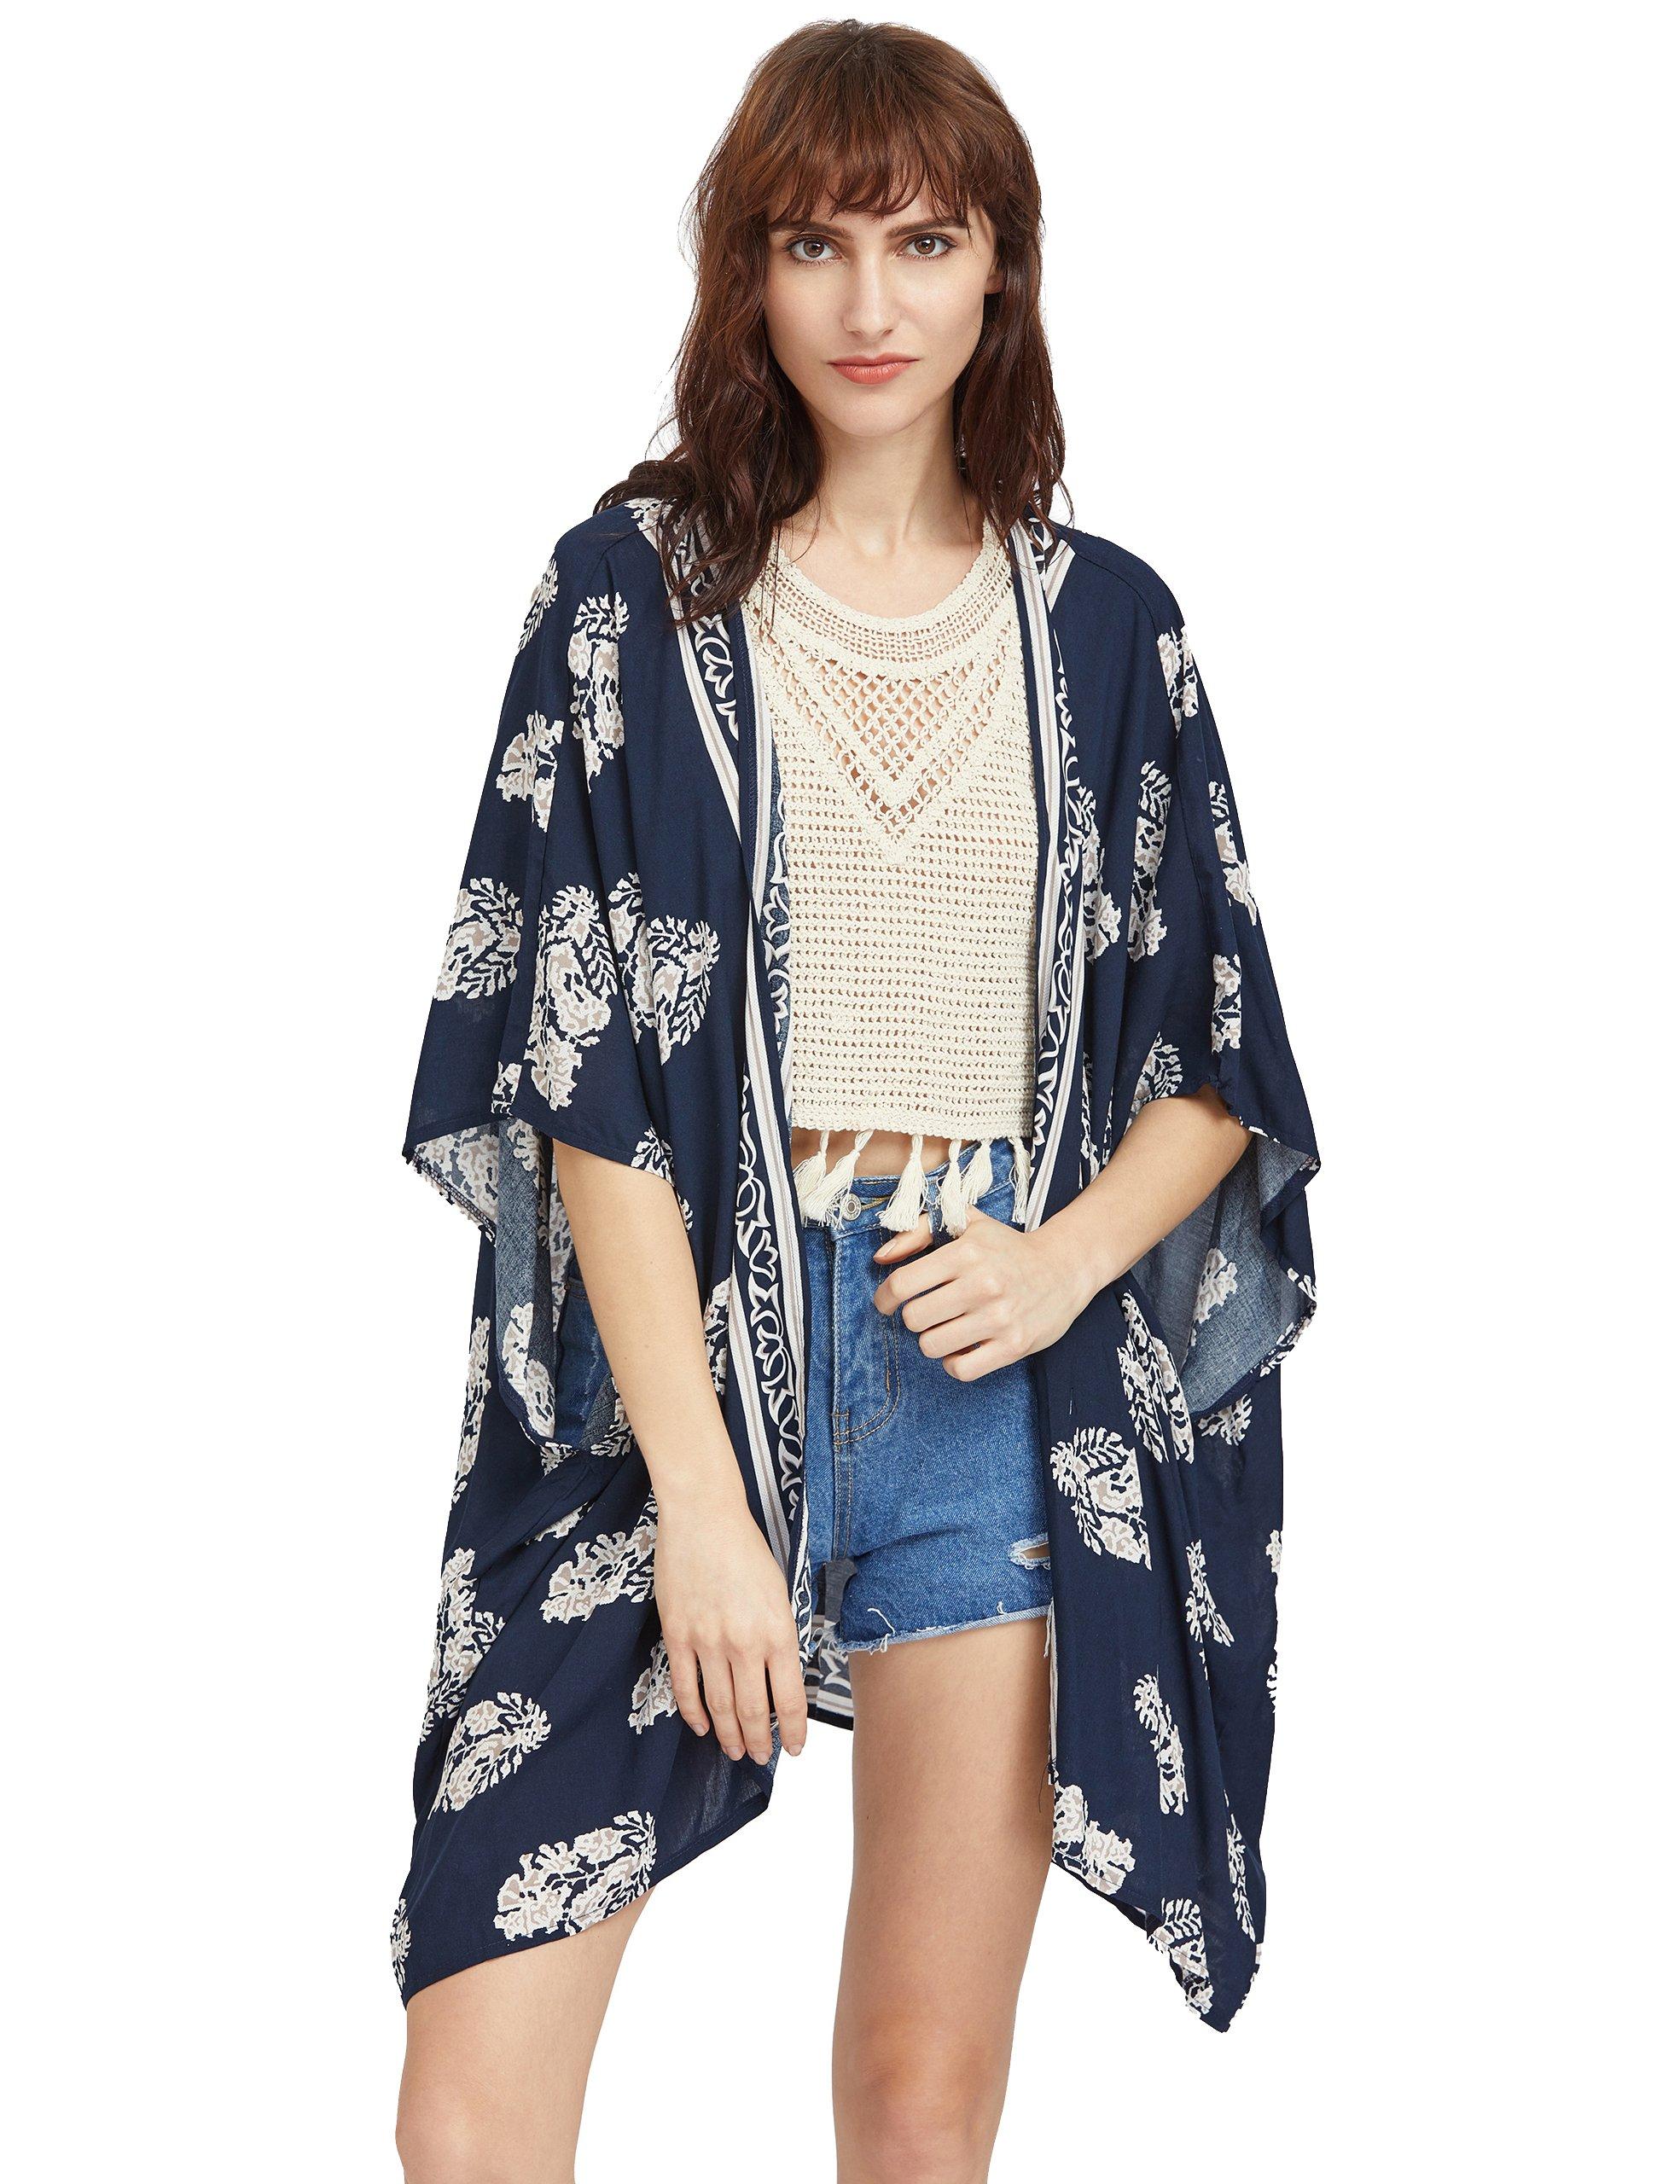 SweatyRocks Women's Boho Kimono Vintage Floral Beach Cover Up Swimwear Navy #2 L